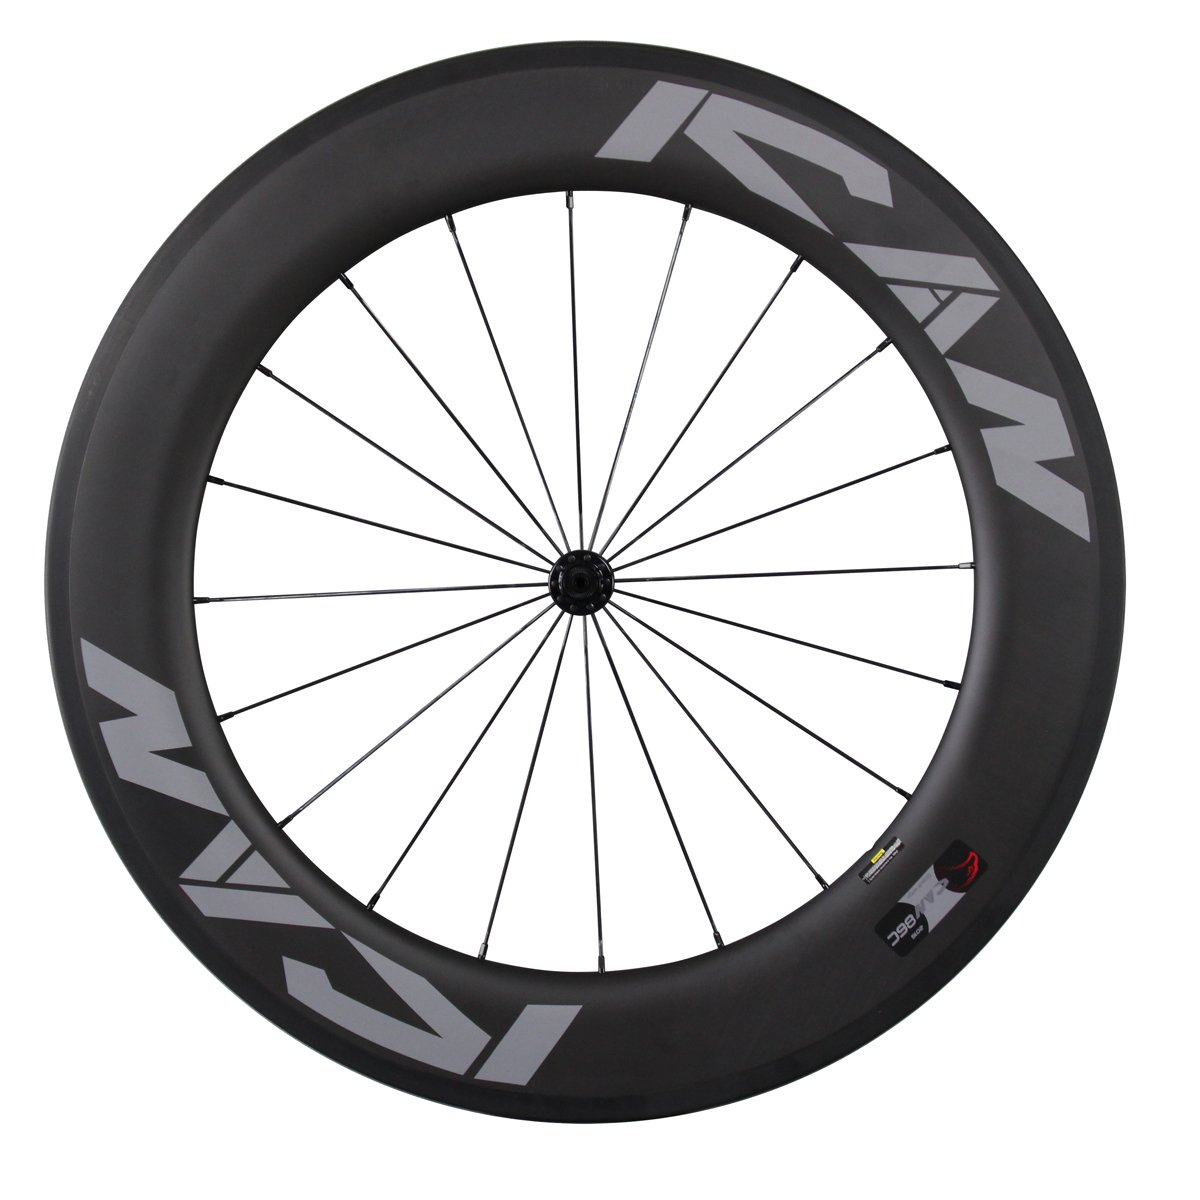 ICAN 86 mm道路カーボンホイールセットクリンチャーホイールReadyバサルトブレーキサーフェスリムPowerway r36ハブ B01E6U9GZY Front wheel-20 holes Front wheel-20 holes